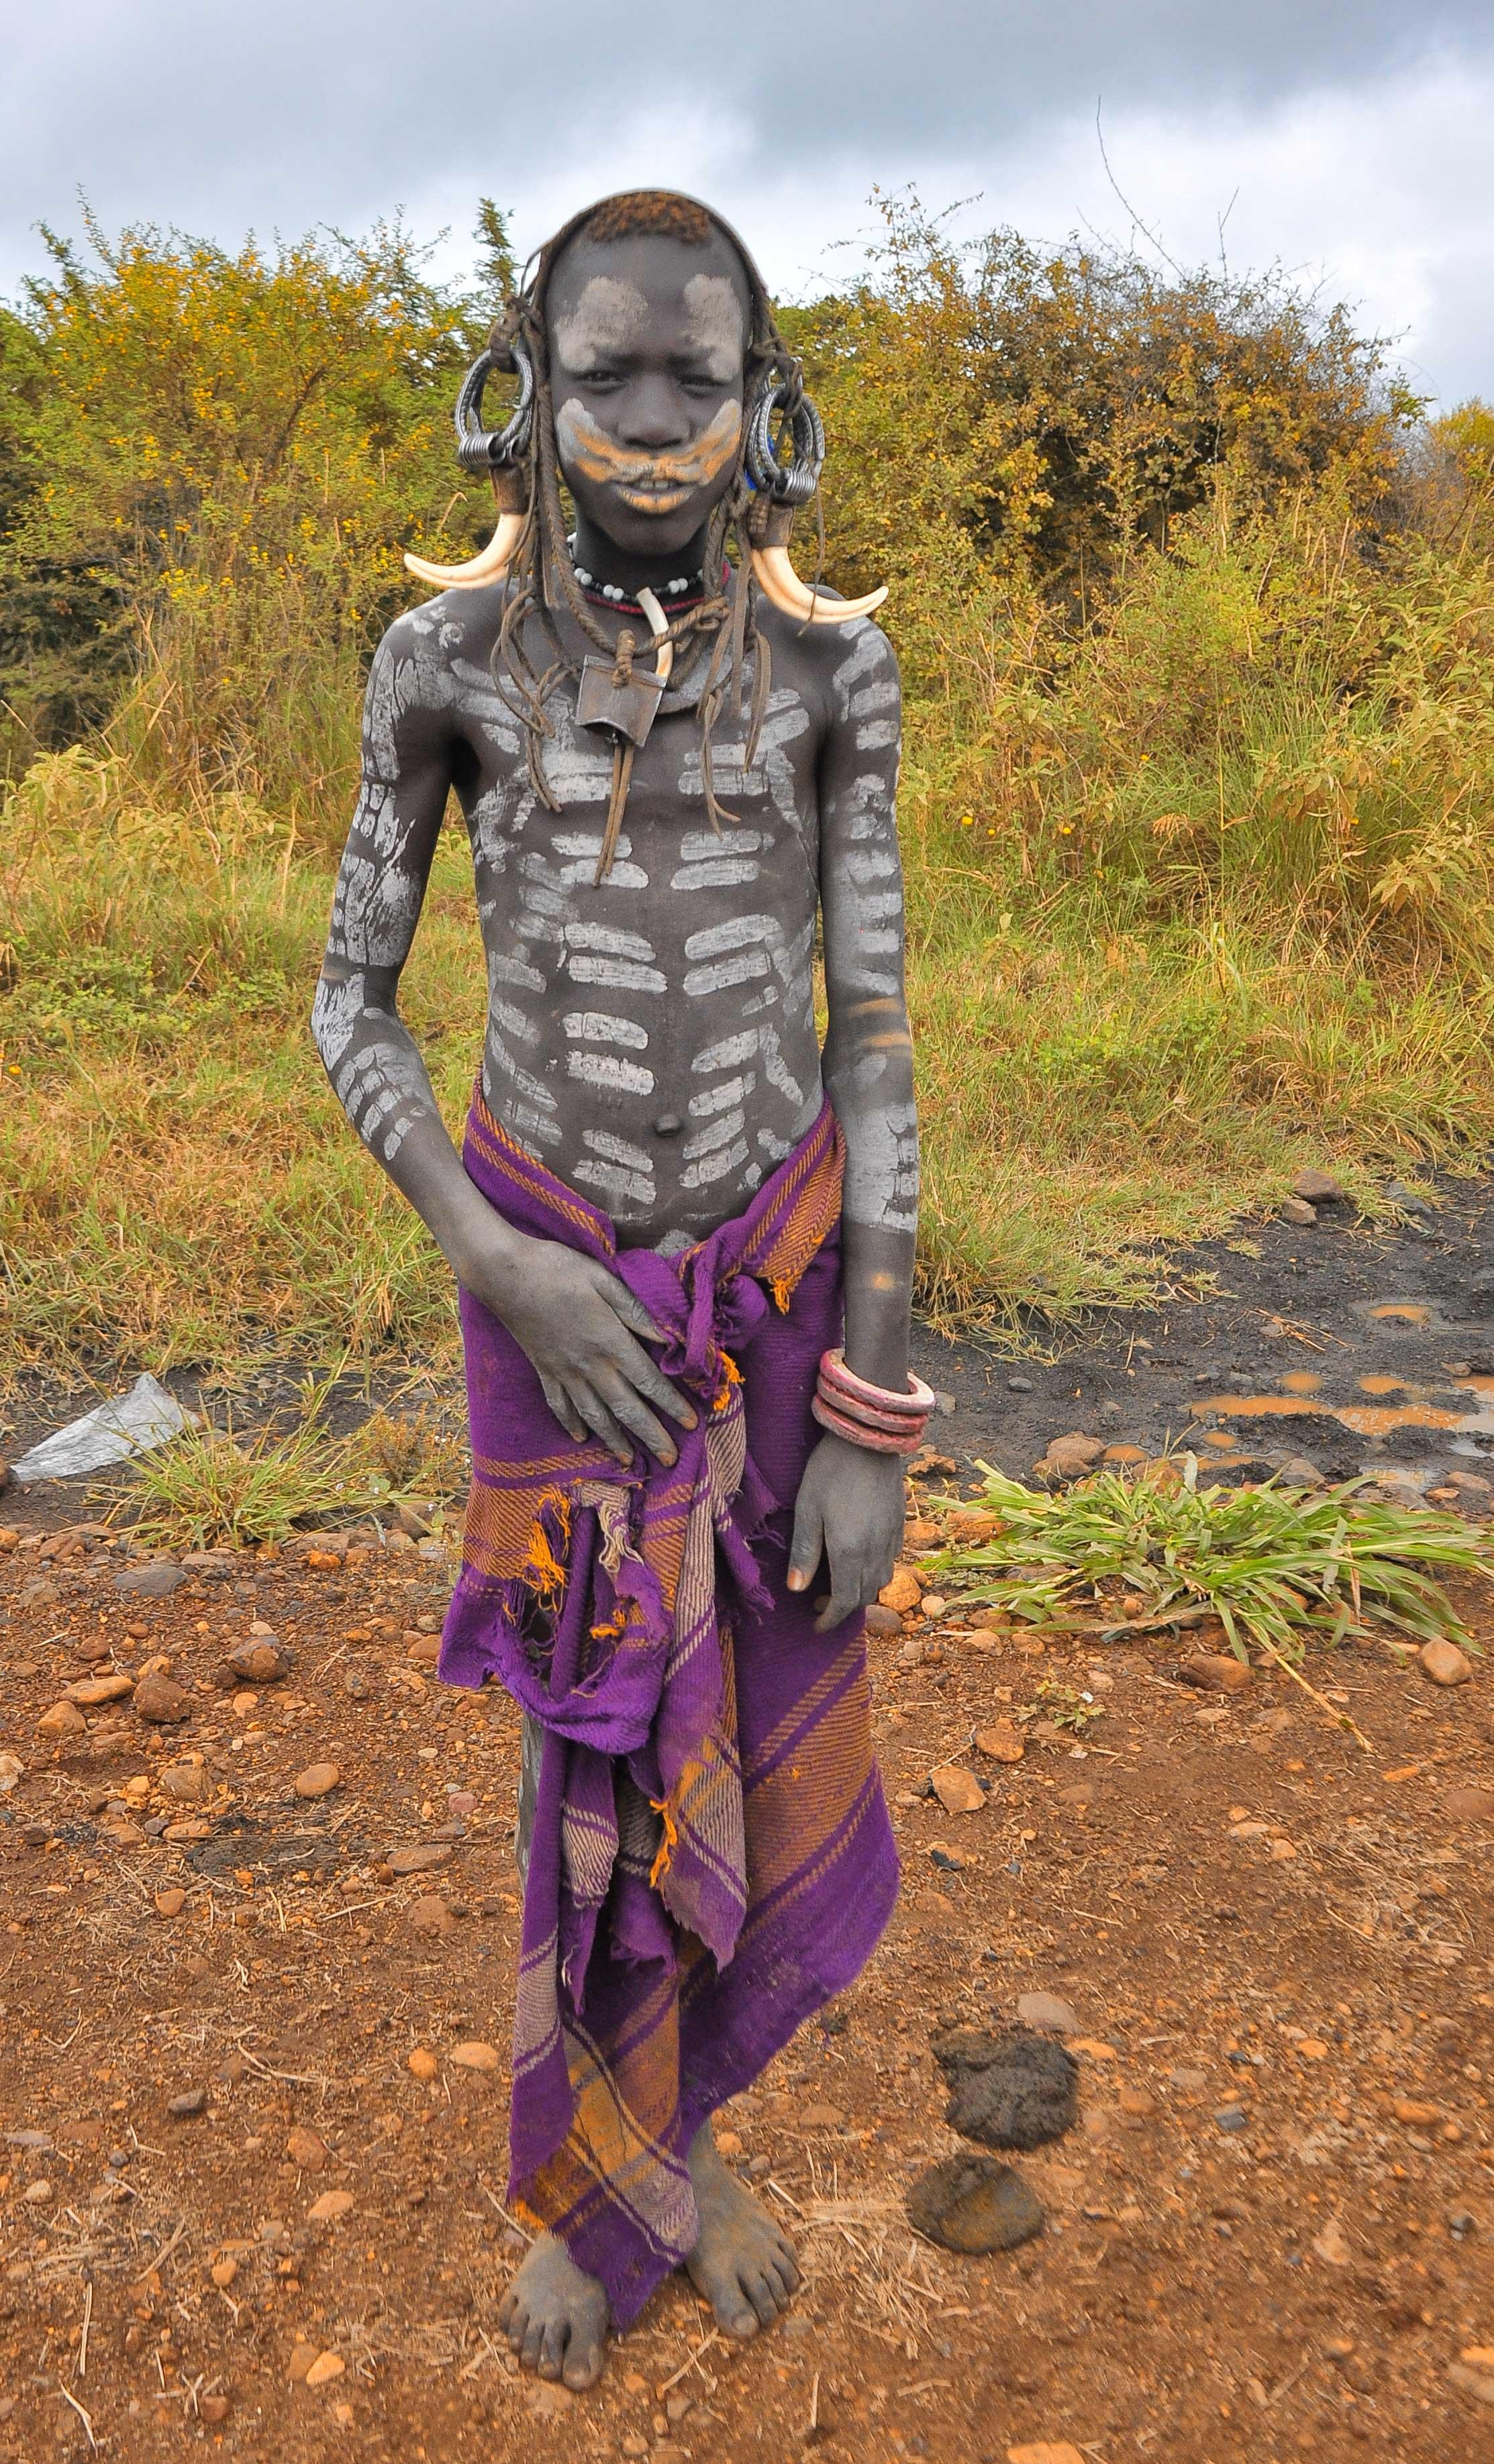 mursi Boy File:Mursi Boy, Ethiopia (10150125004).jpg